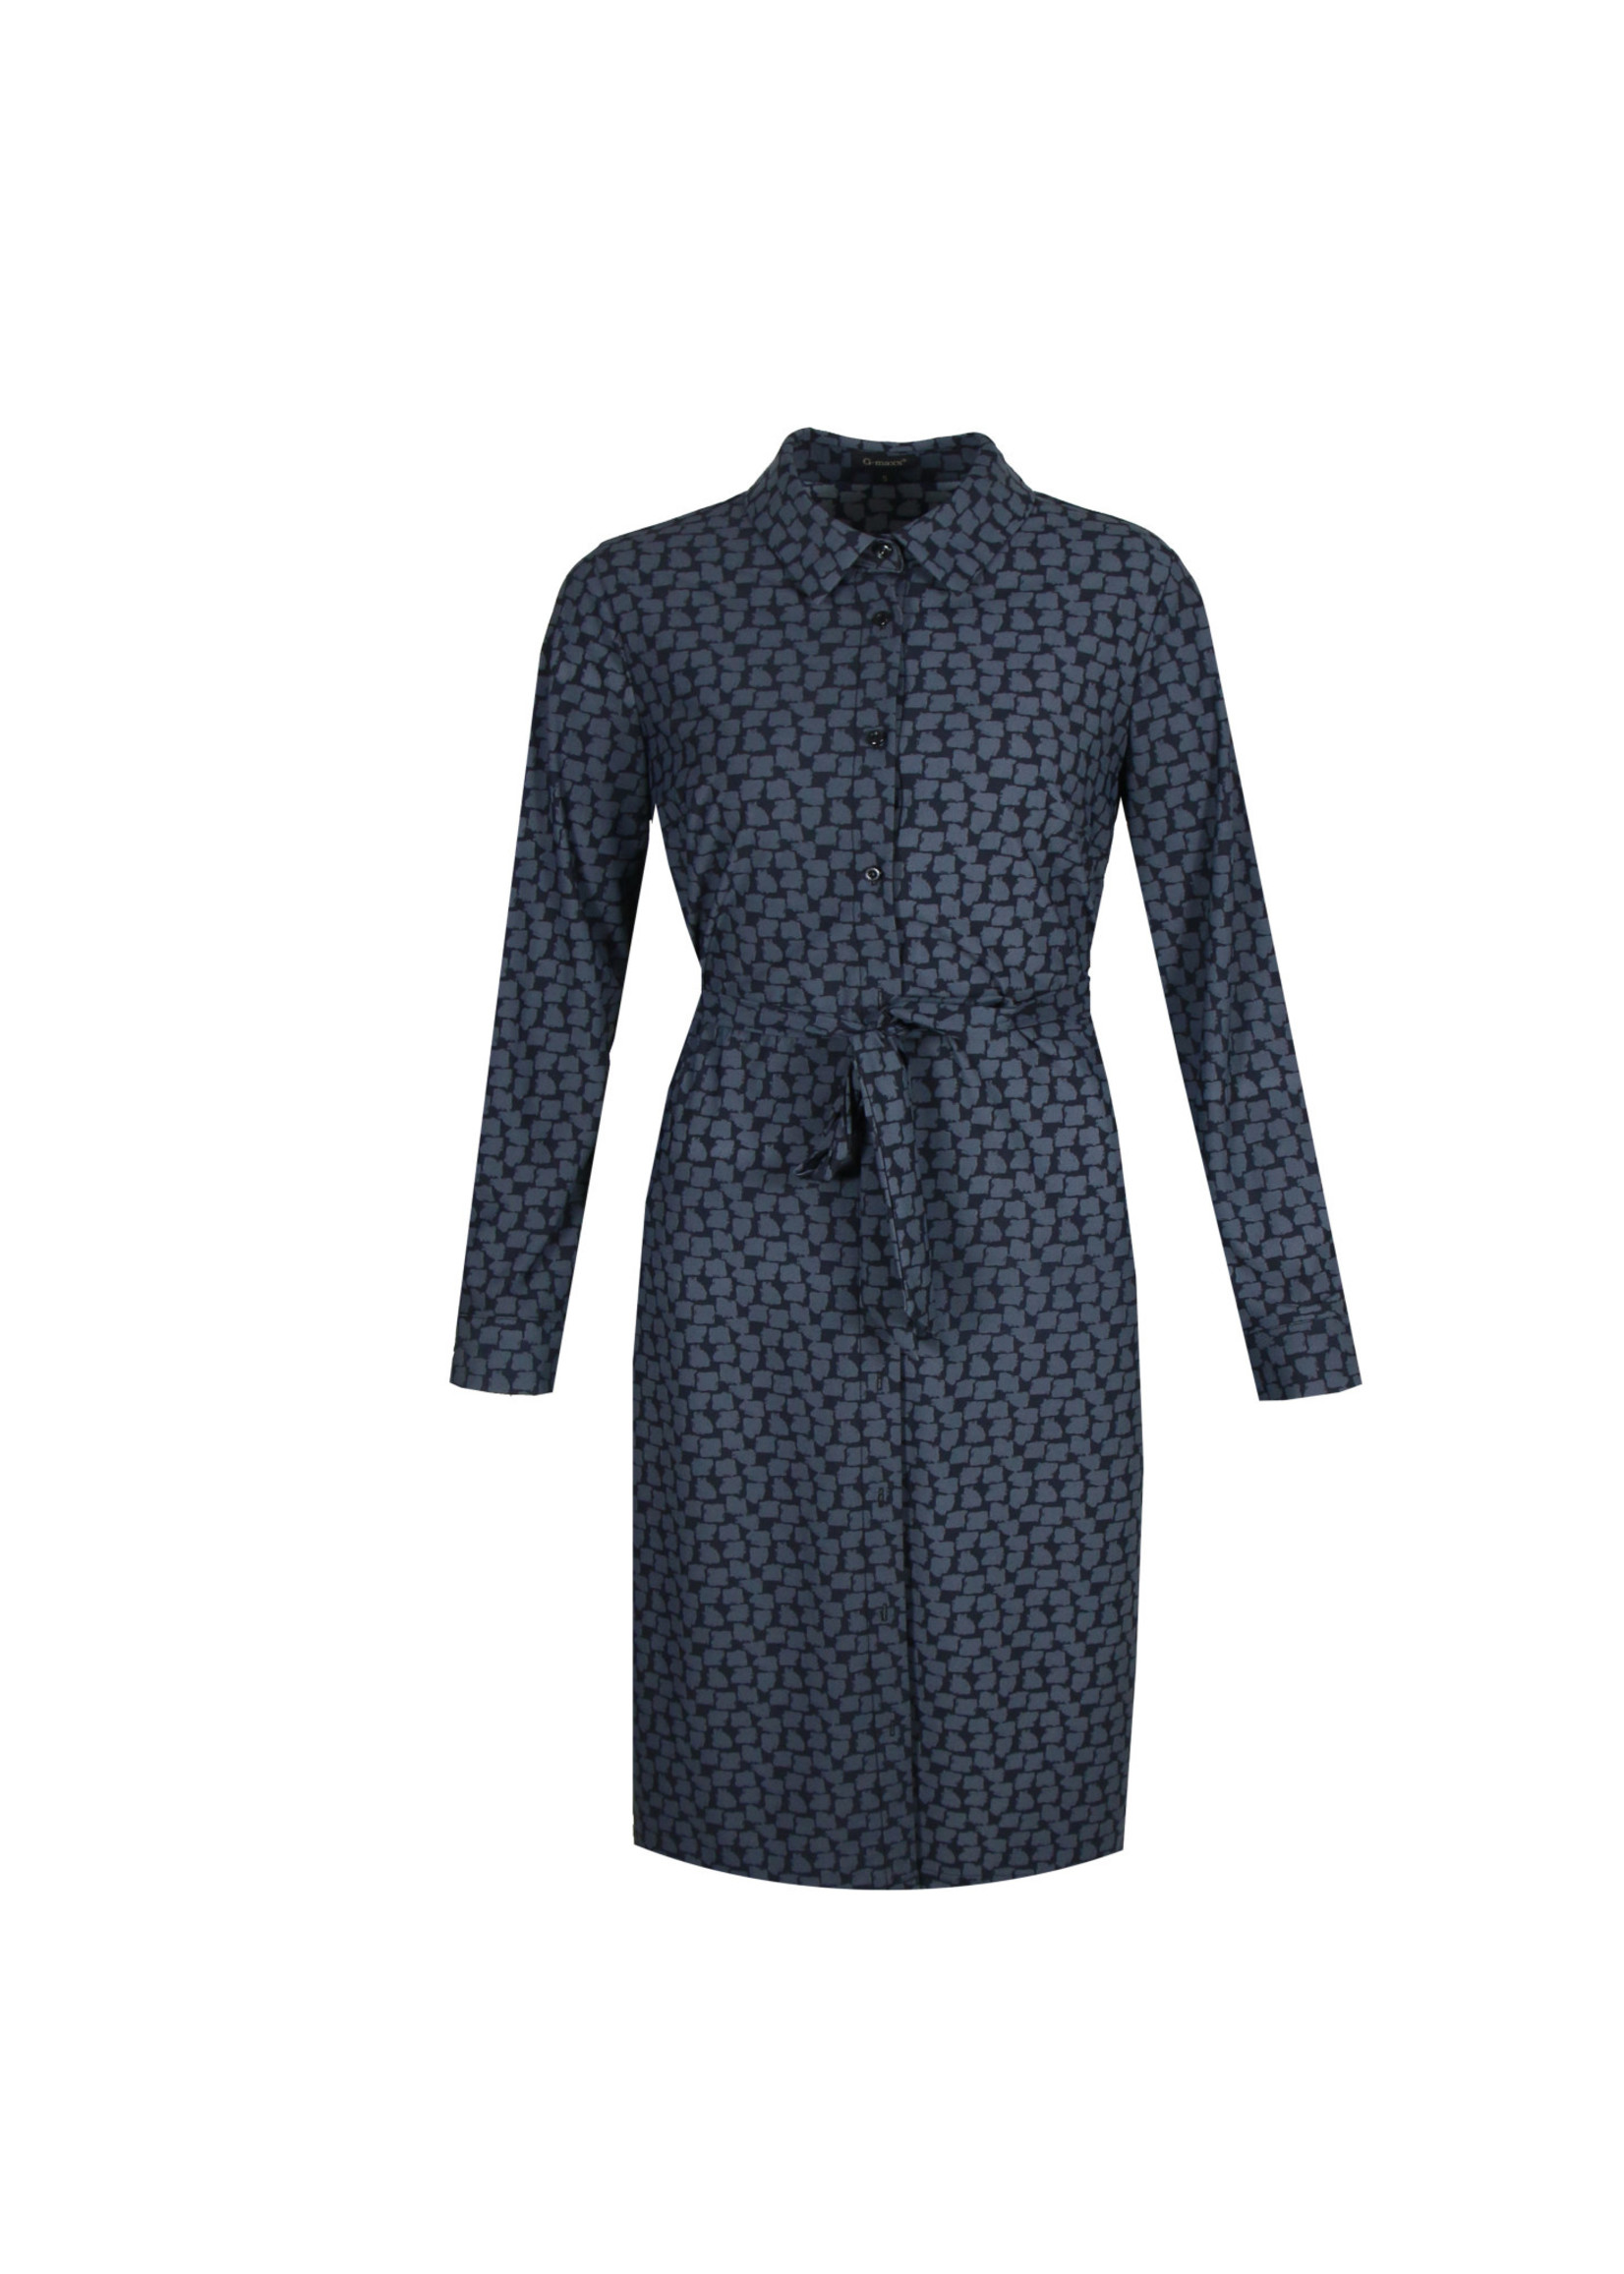 G-Maxx G-maxx - Chibi jurk - Zwart/jeansblauw